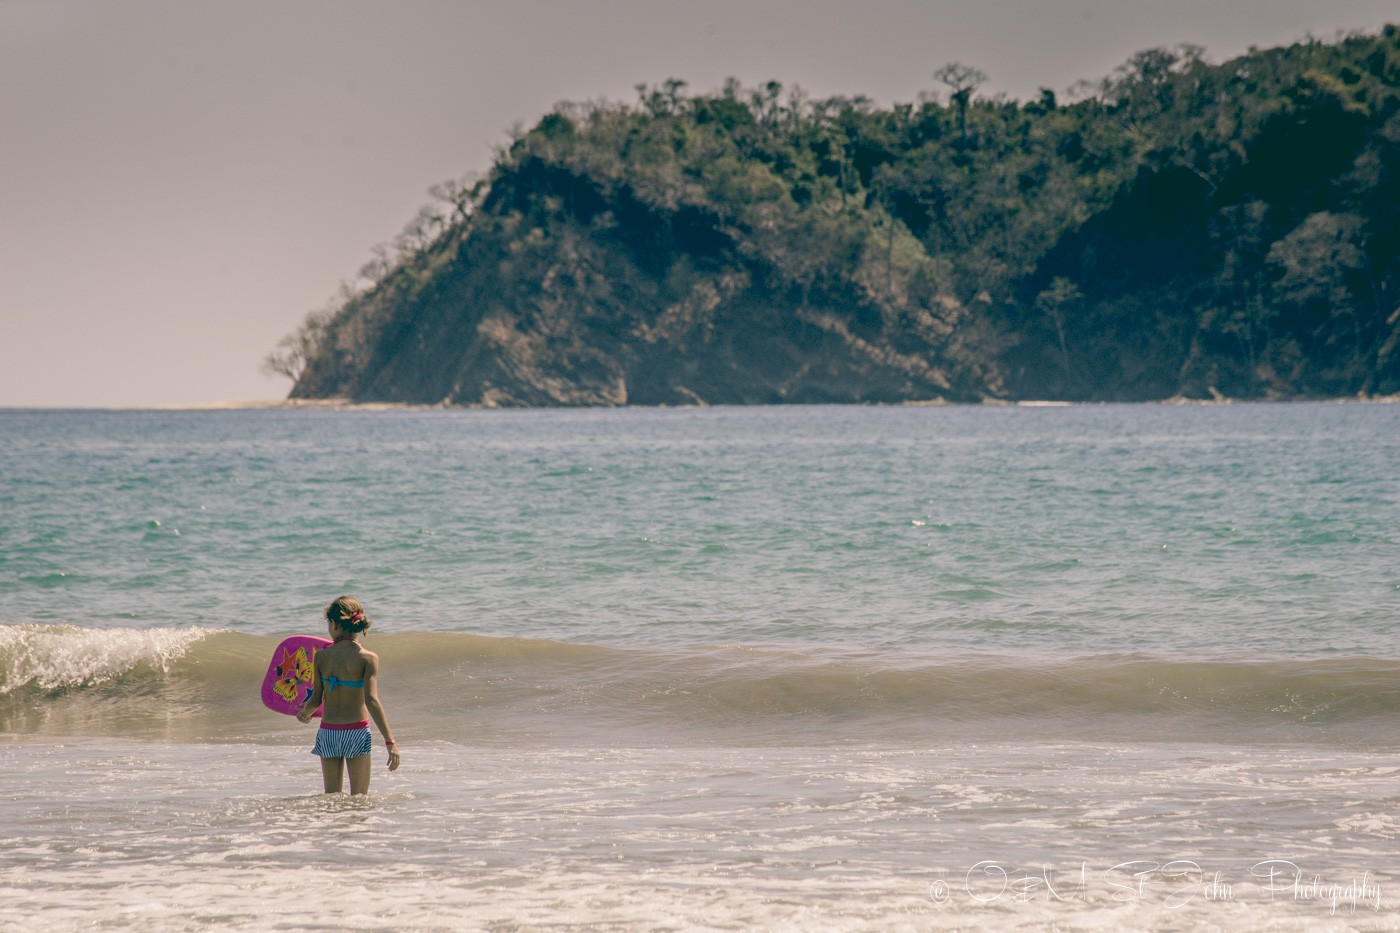 Little girl playing in the water on Playa Samara Costa Rica